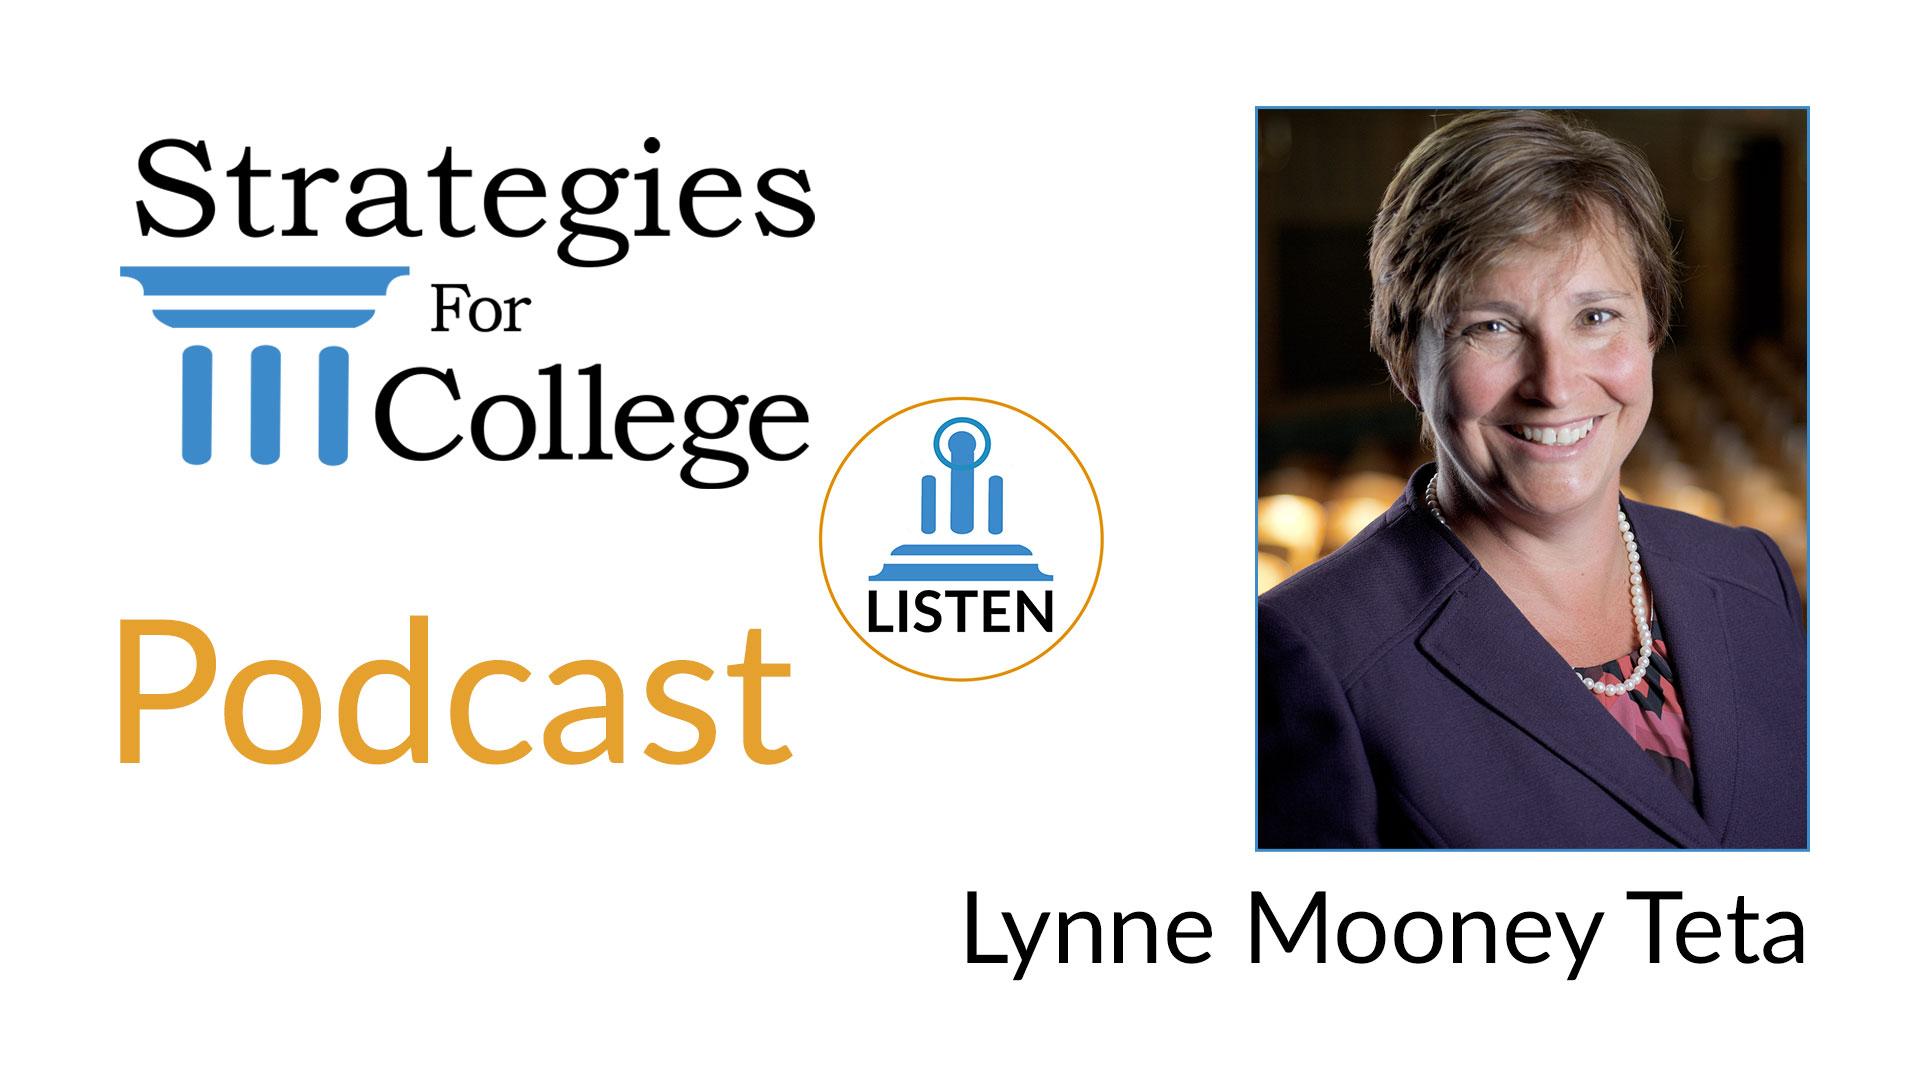 Podcast: Lynne Mooney Teta